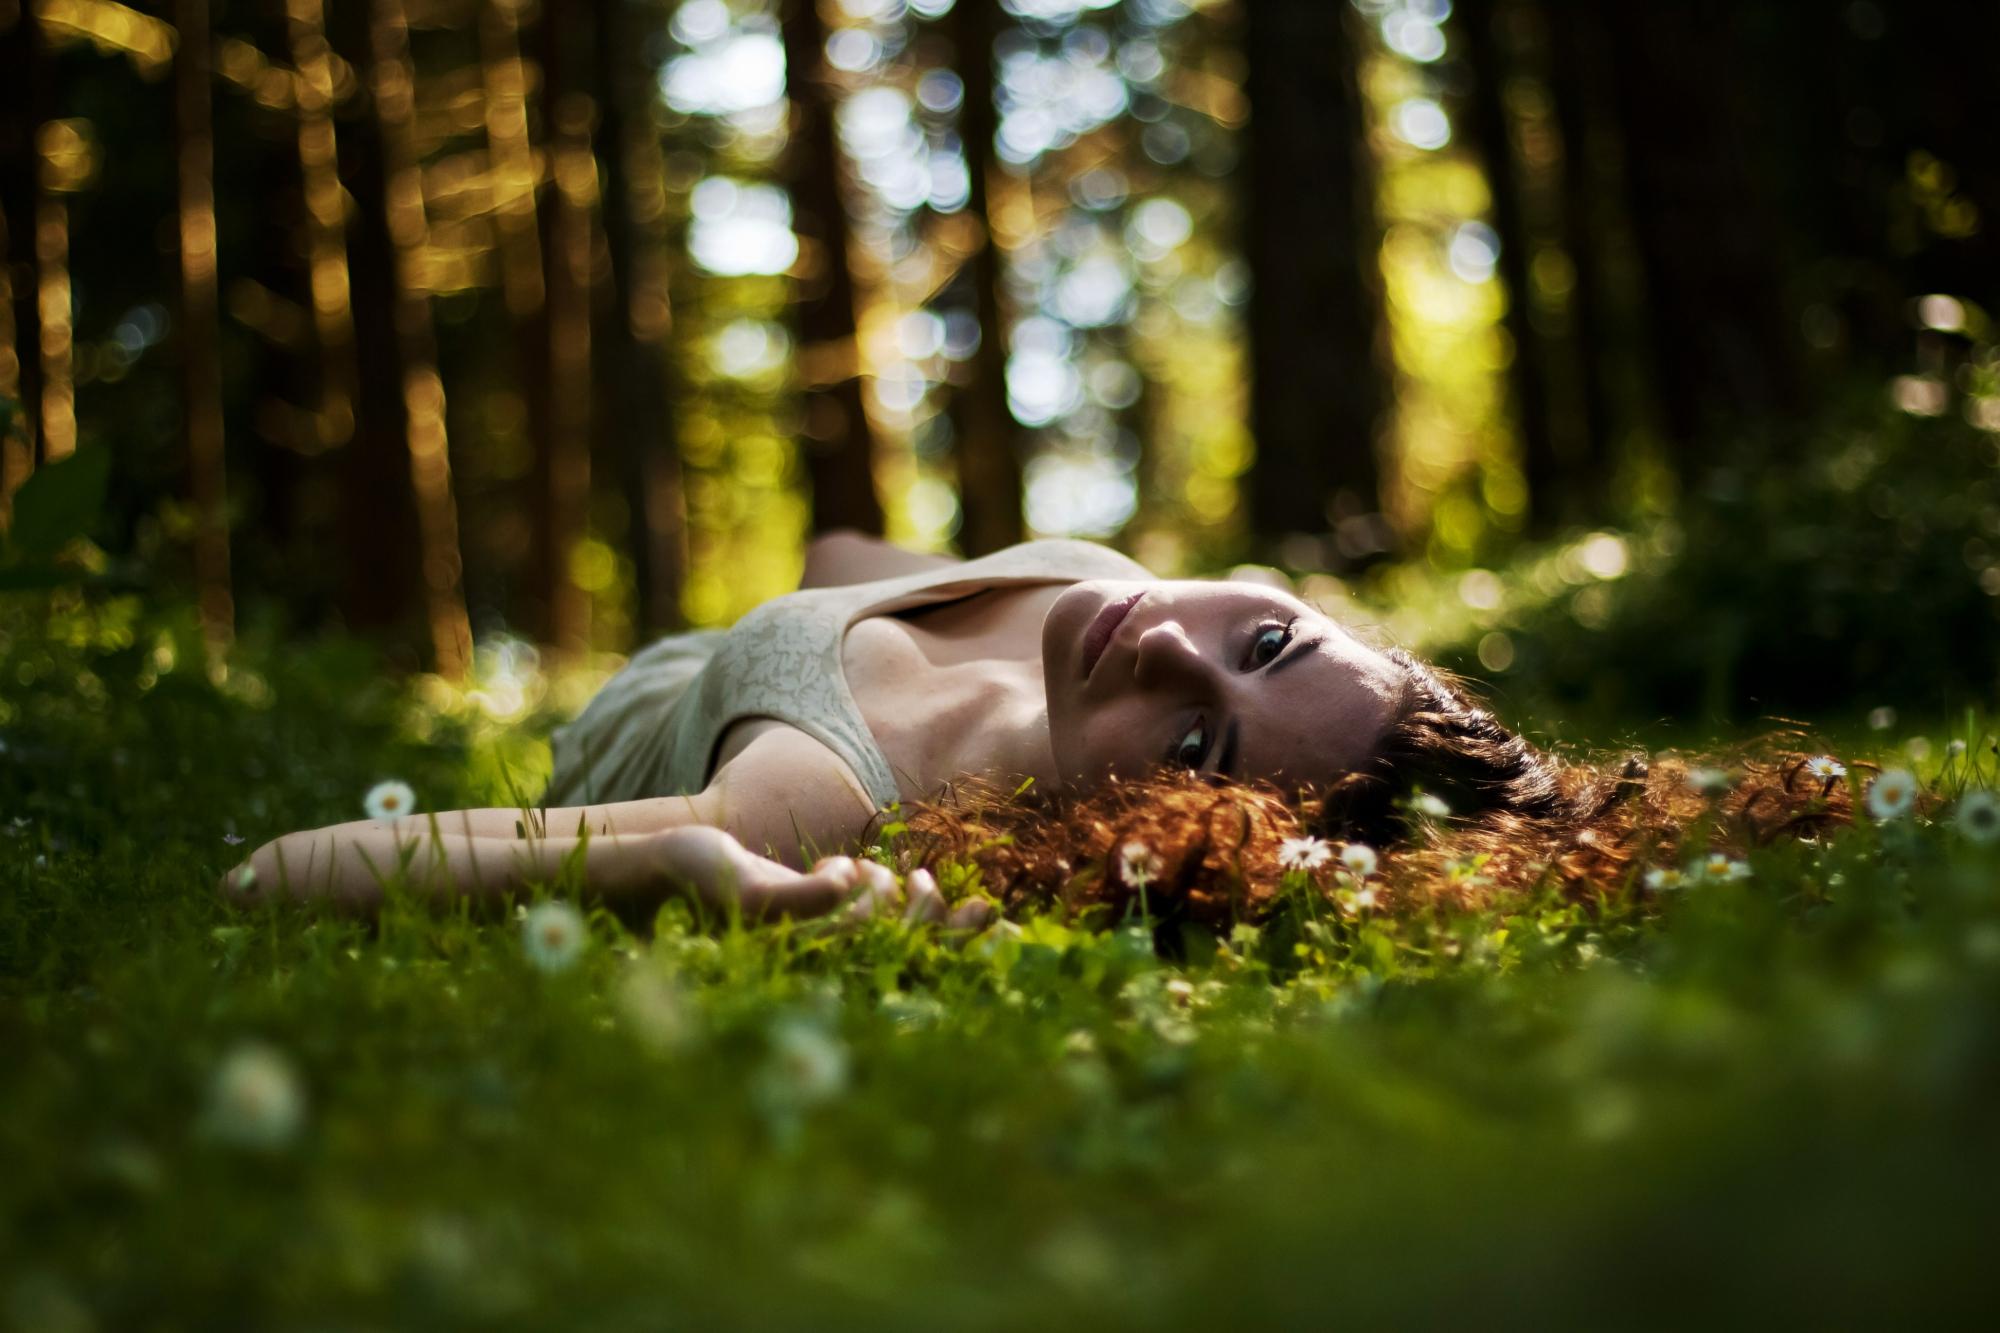 картинки релаксация лес берет